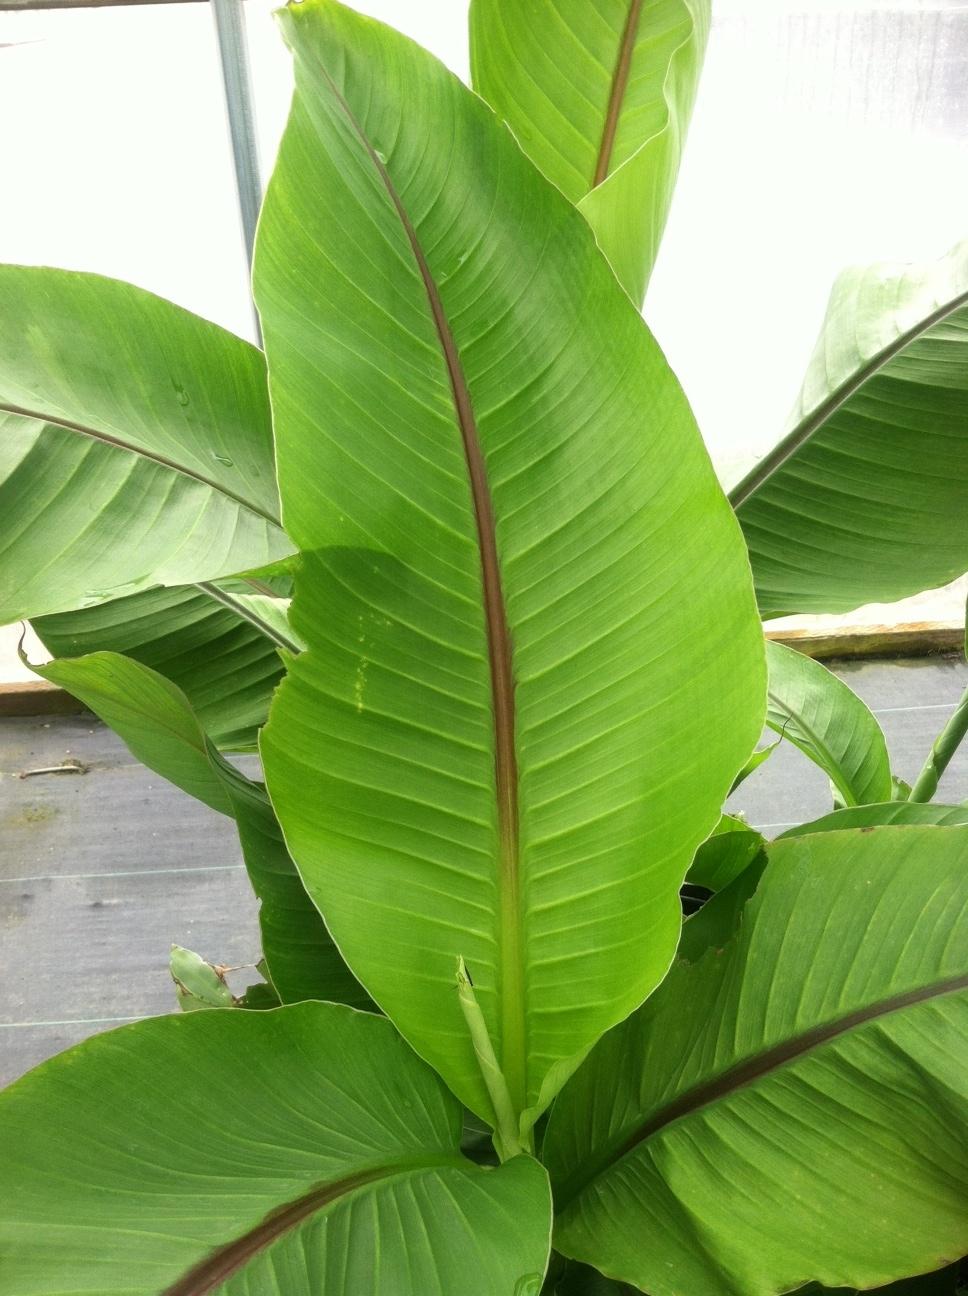 Banana leaf, close up